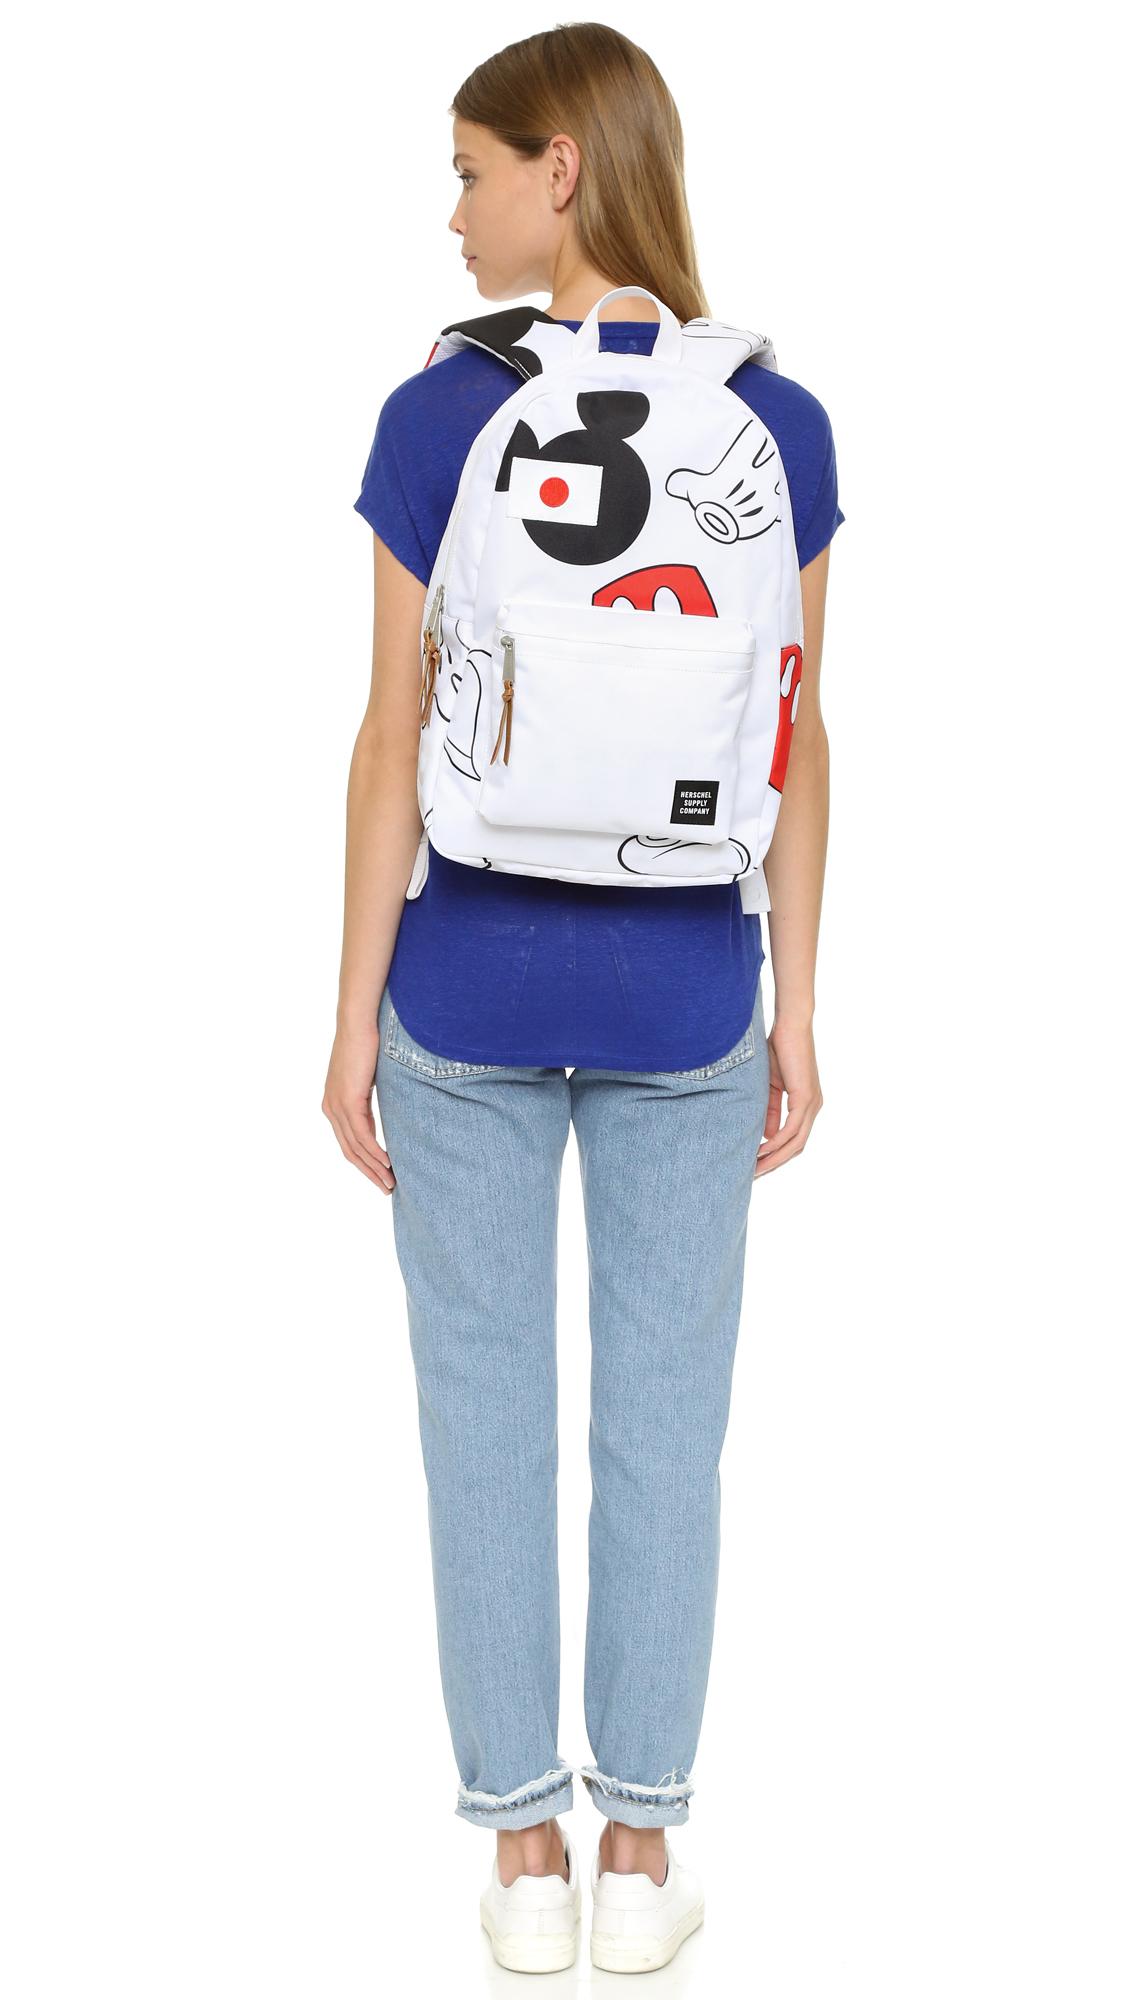 Herschel Supply Co. Disney X Herschel Settlement Backpack in White